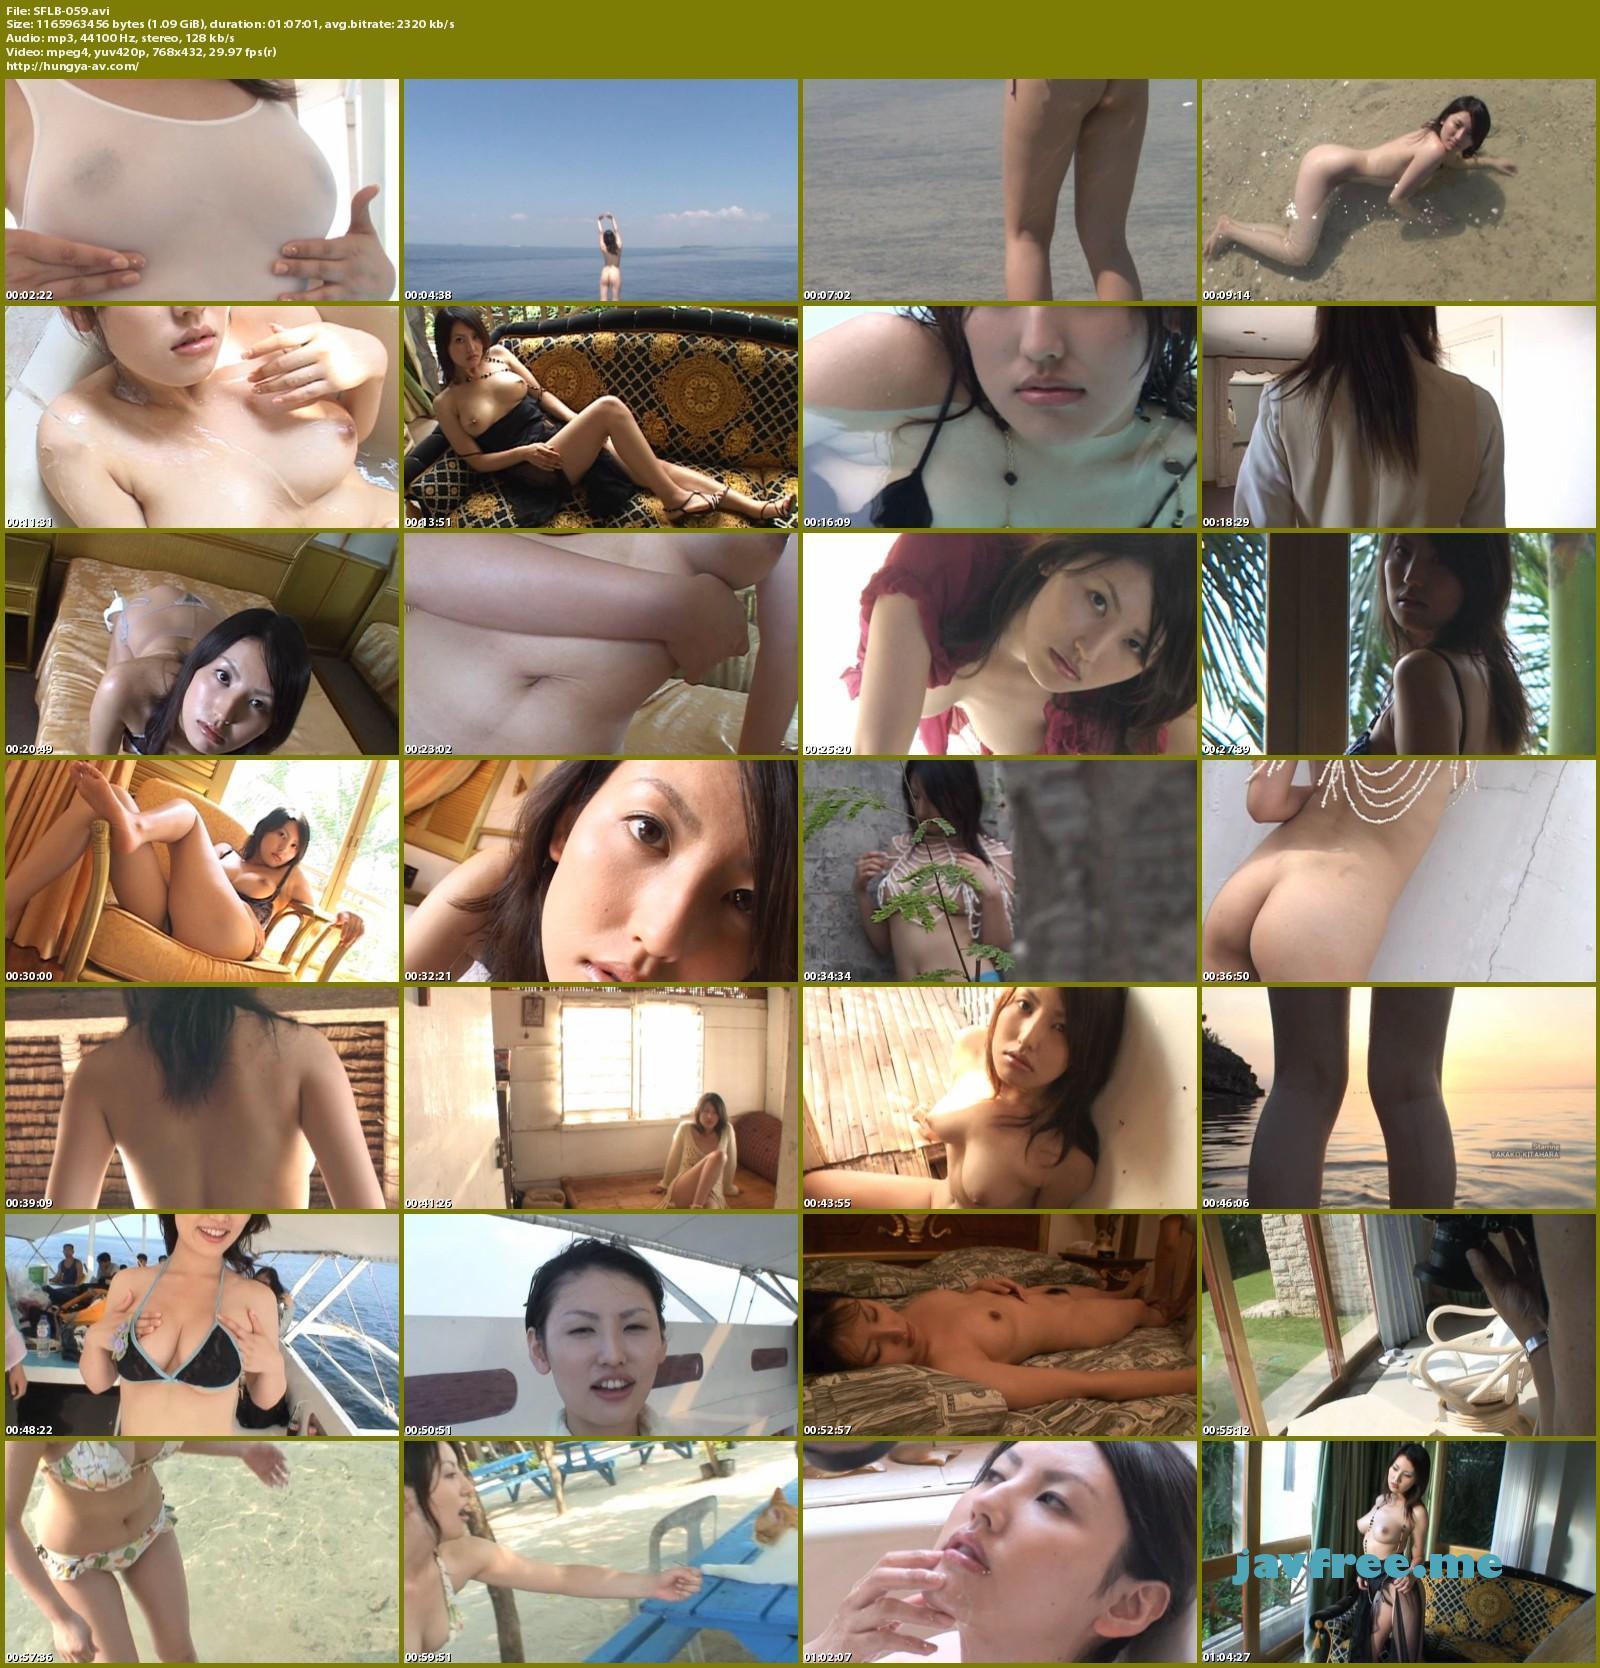 [SFLB-059] 裸体 北原多香子 - image SFLB-059_s on https://javfree.me